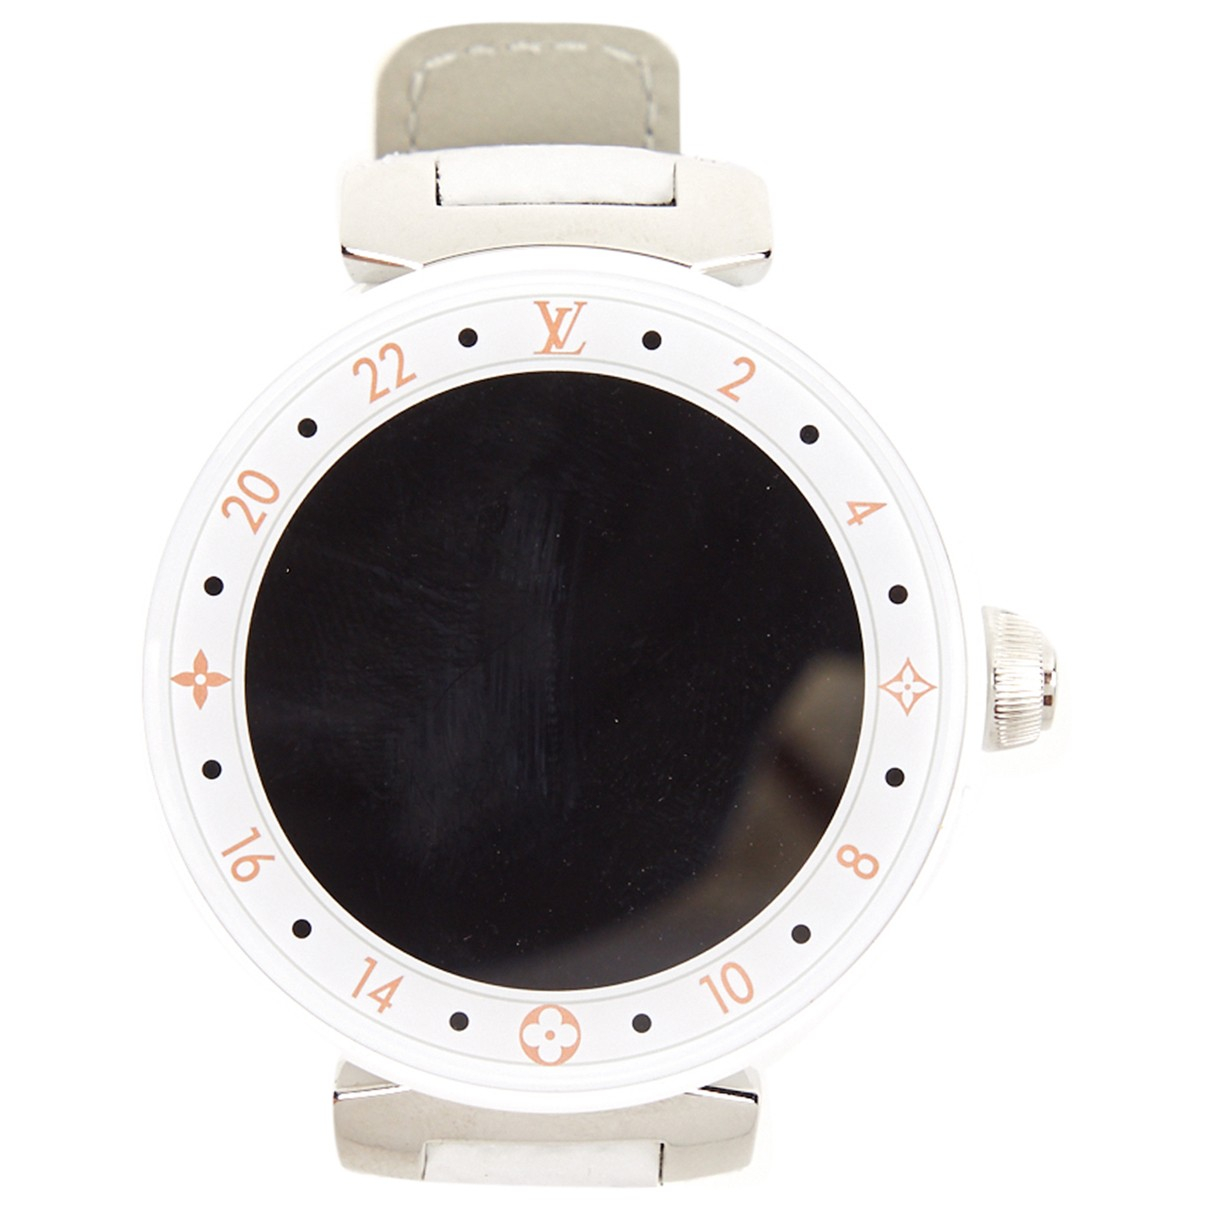 Louis Vuitton Tambour Horizon Uhr in  Weiss Keramik